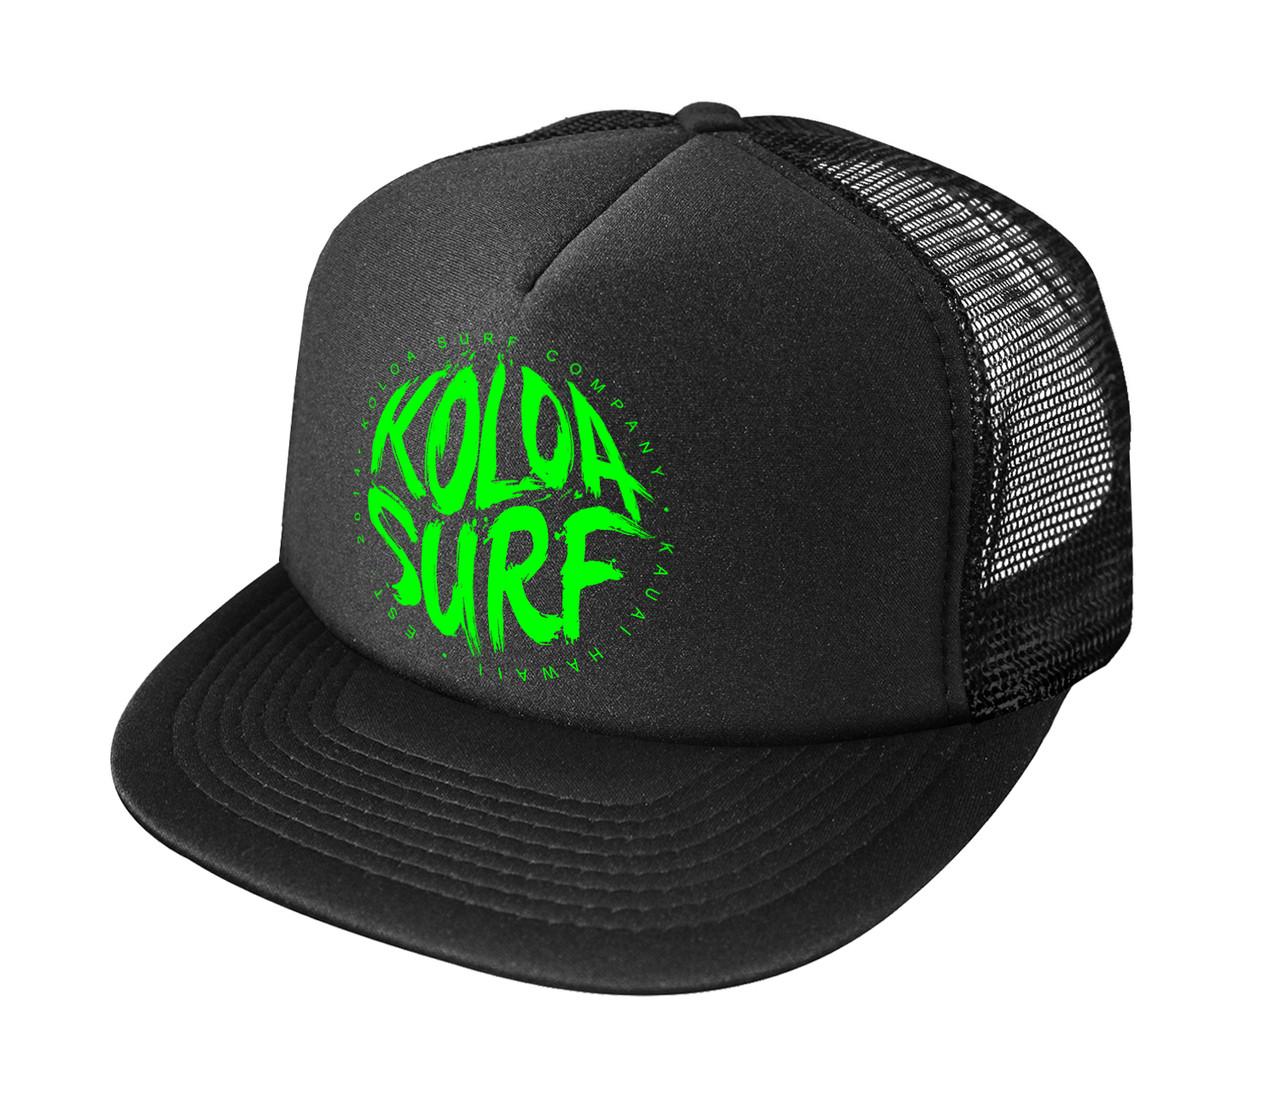 469ffcee194 ... Printed Logo Poly-Foam Mesh Snapback High Profile Trucker Hats Black    Green logo. White   Green logo